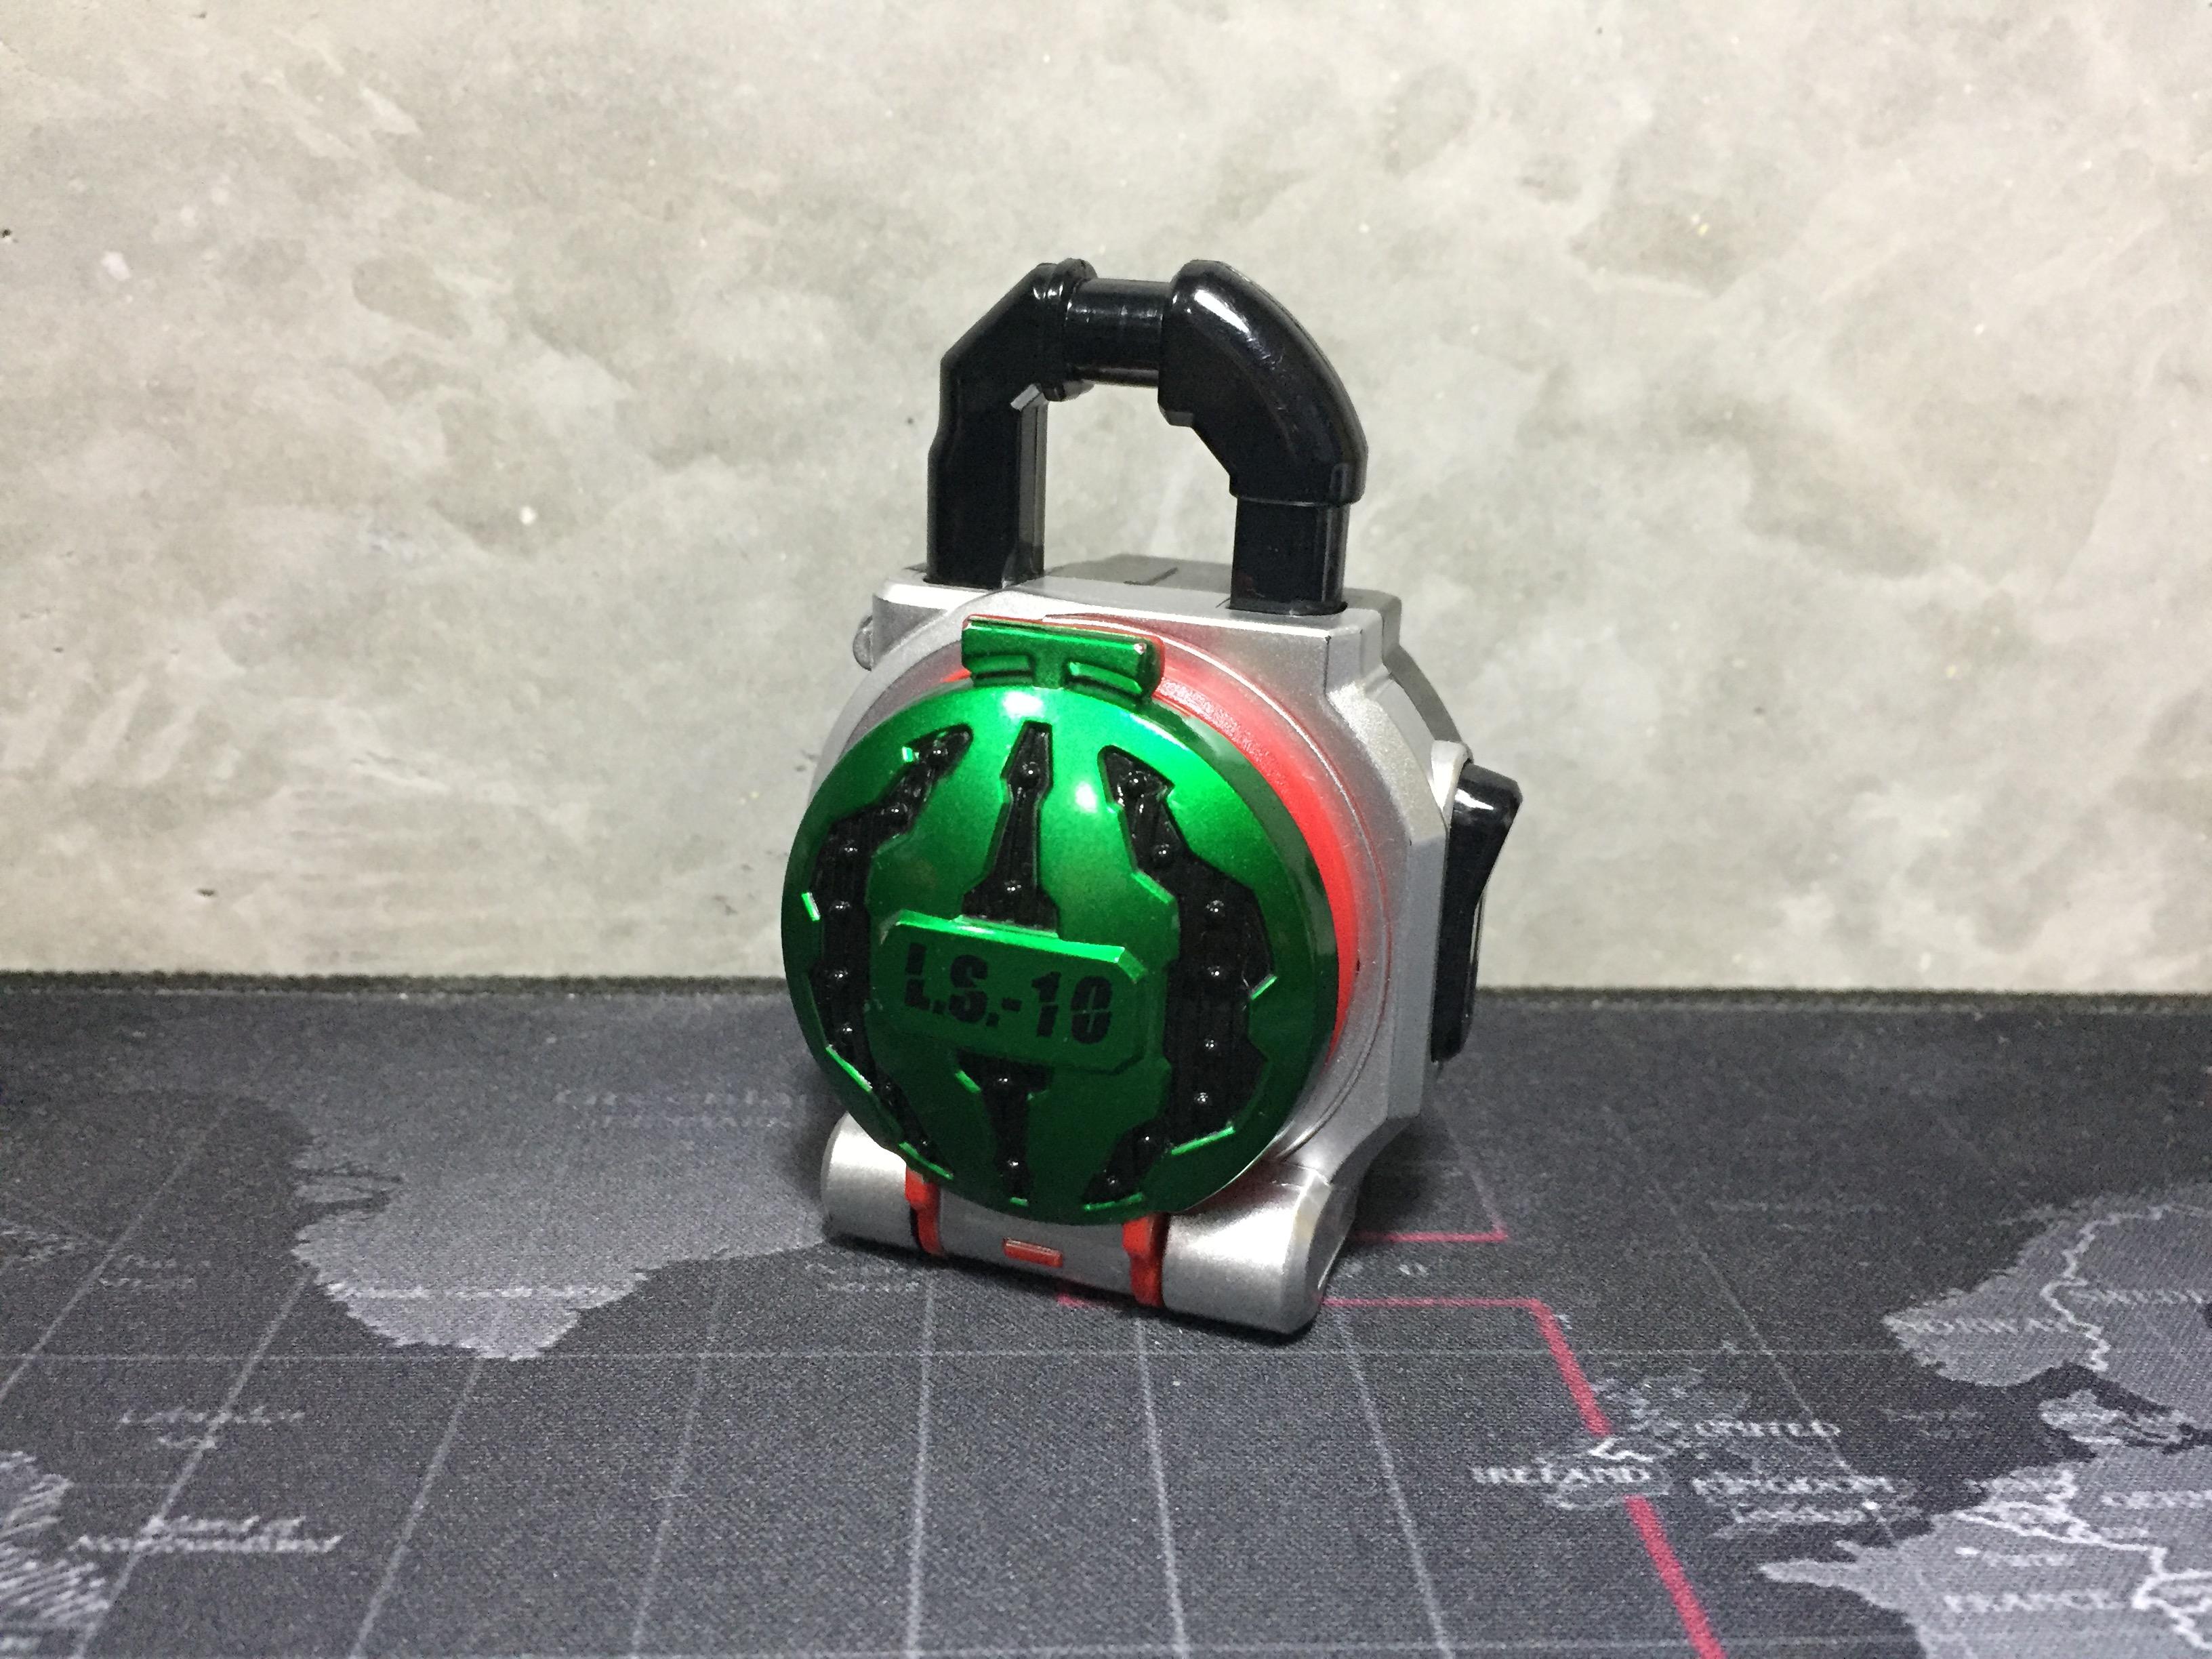 Kamen Rider Gaim Candy Lock Seed L.S.-10 Suika